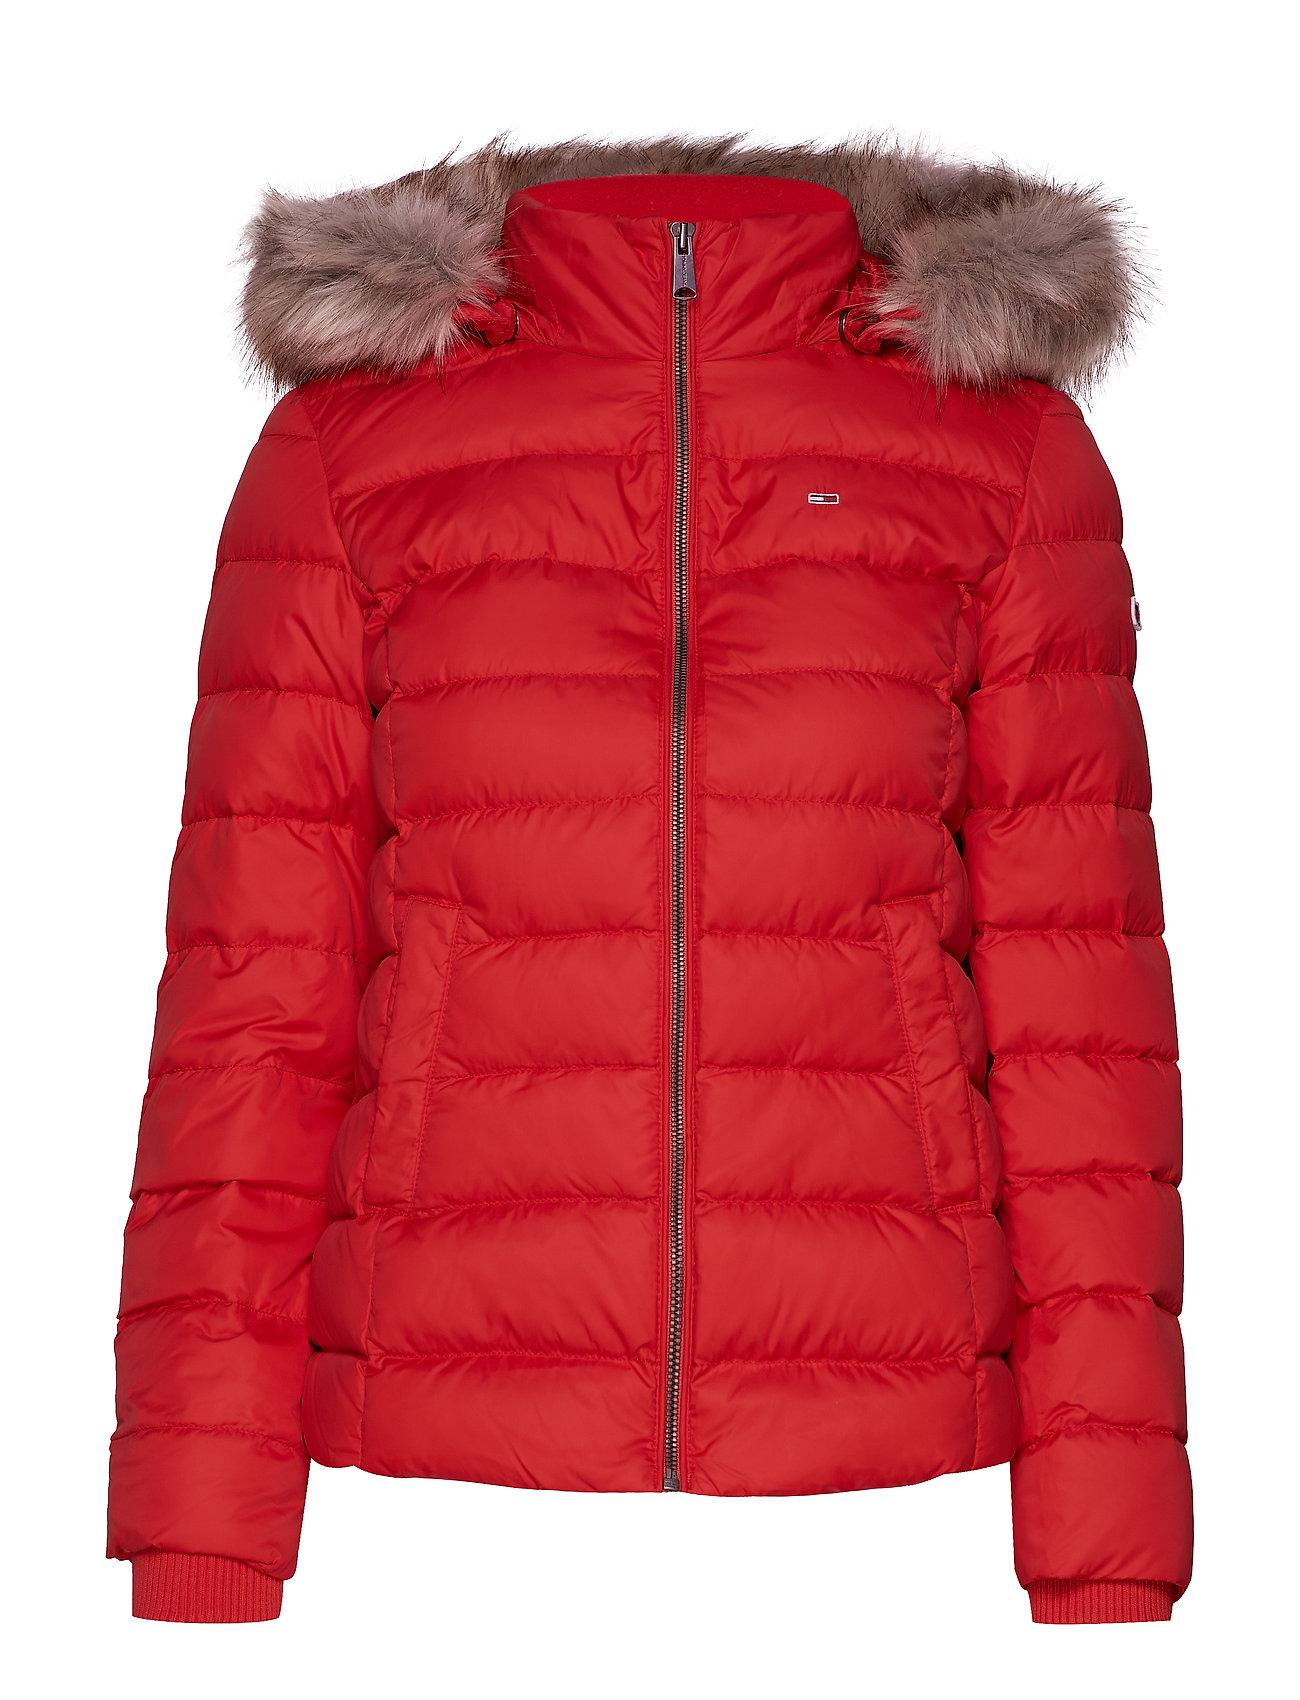 Essential ScarletTommy Hoodedflame Essential Tjw ScarletTommy Jeans Hoodedflame Tjw nOwm80vN